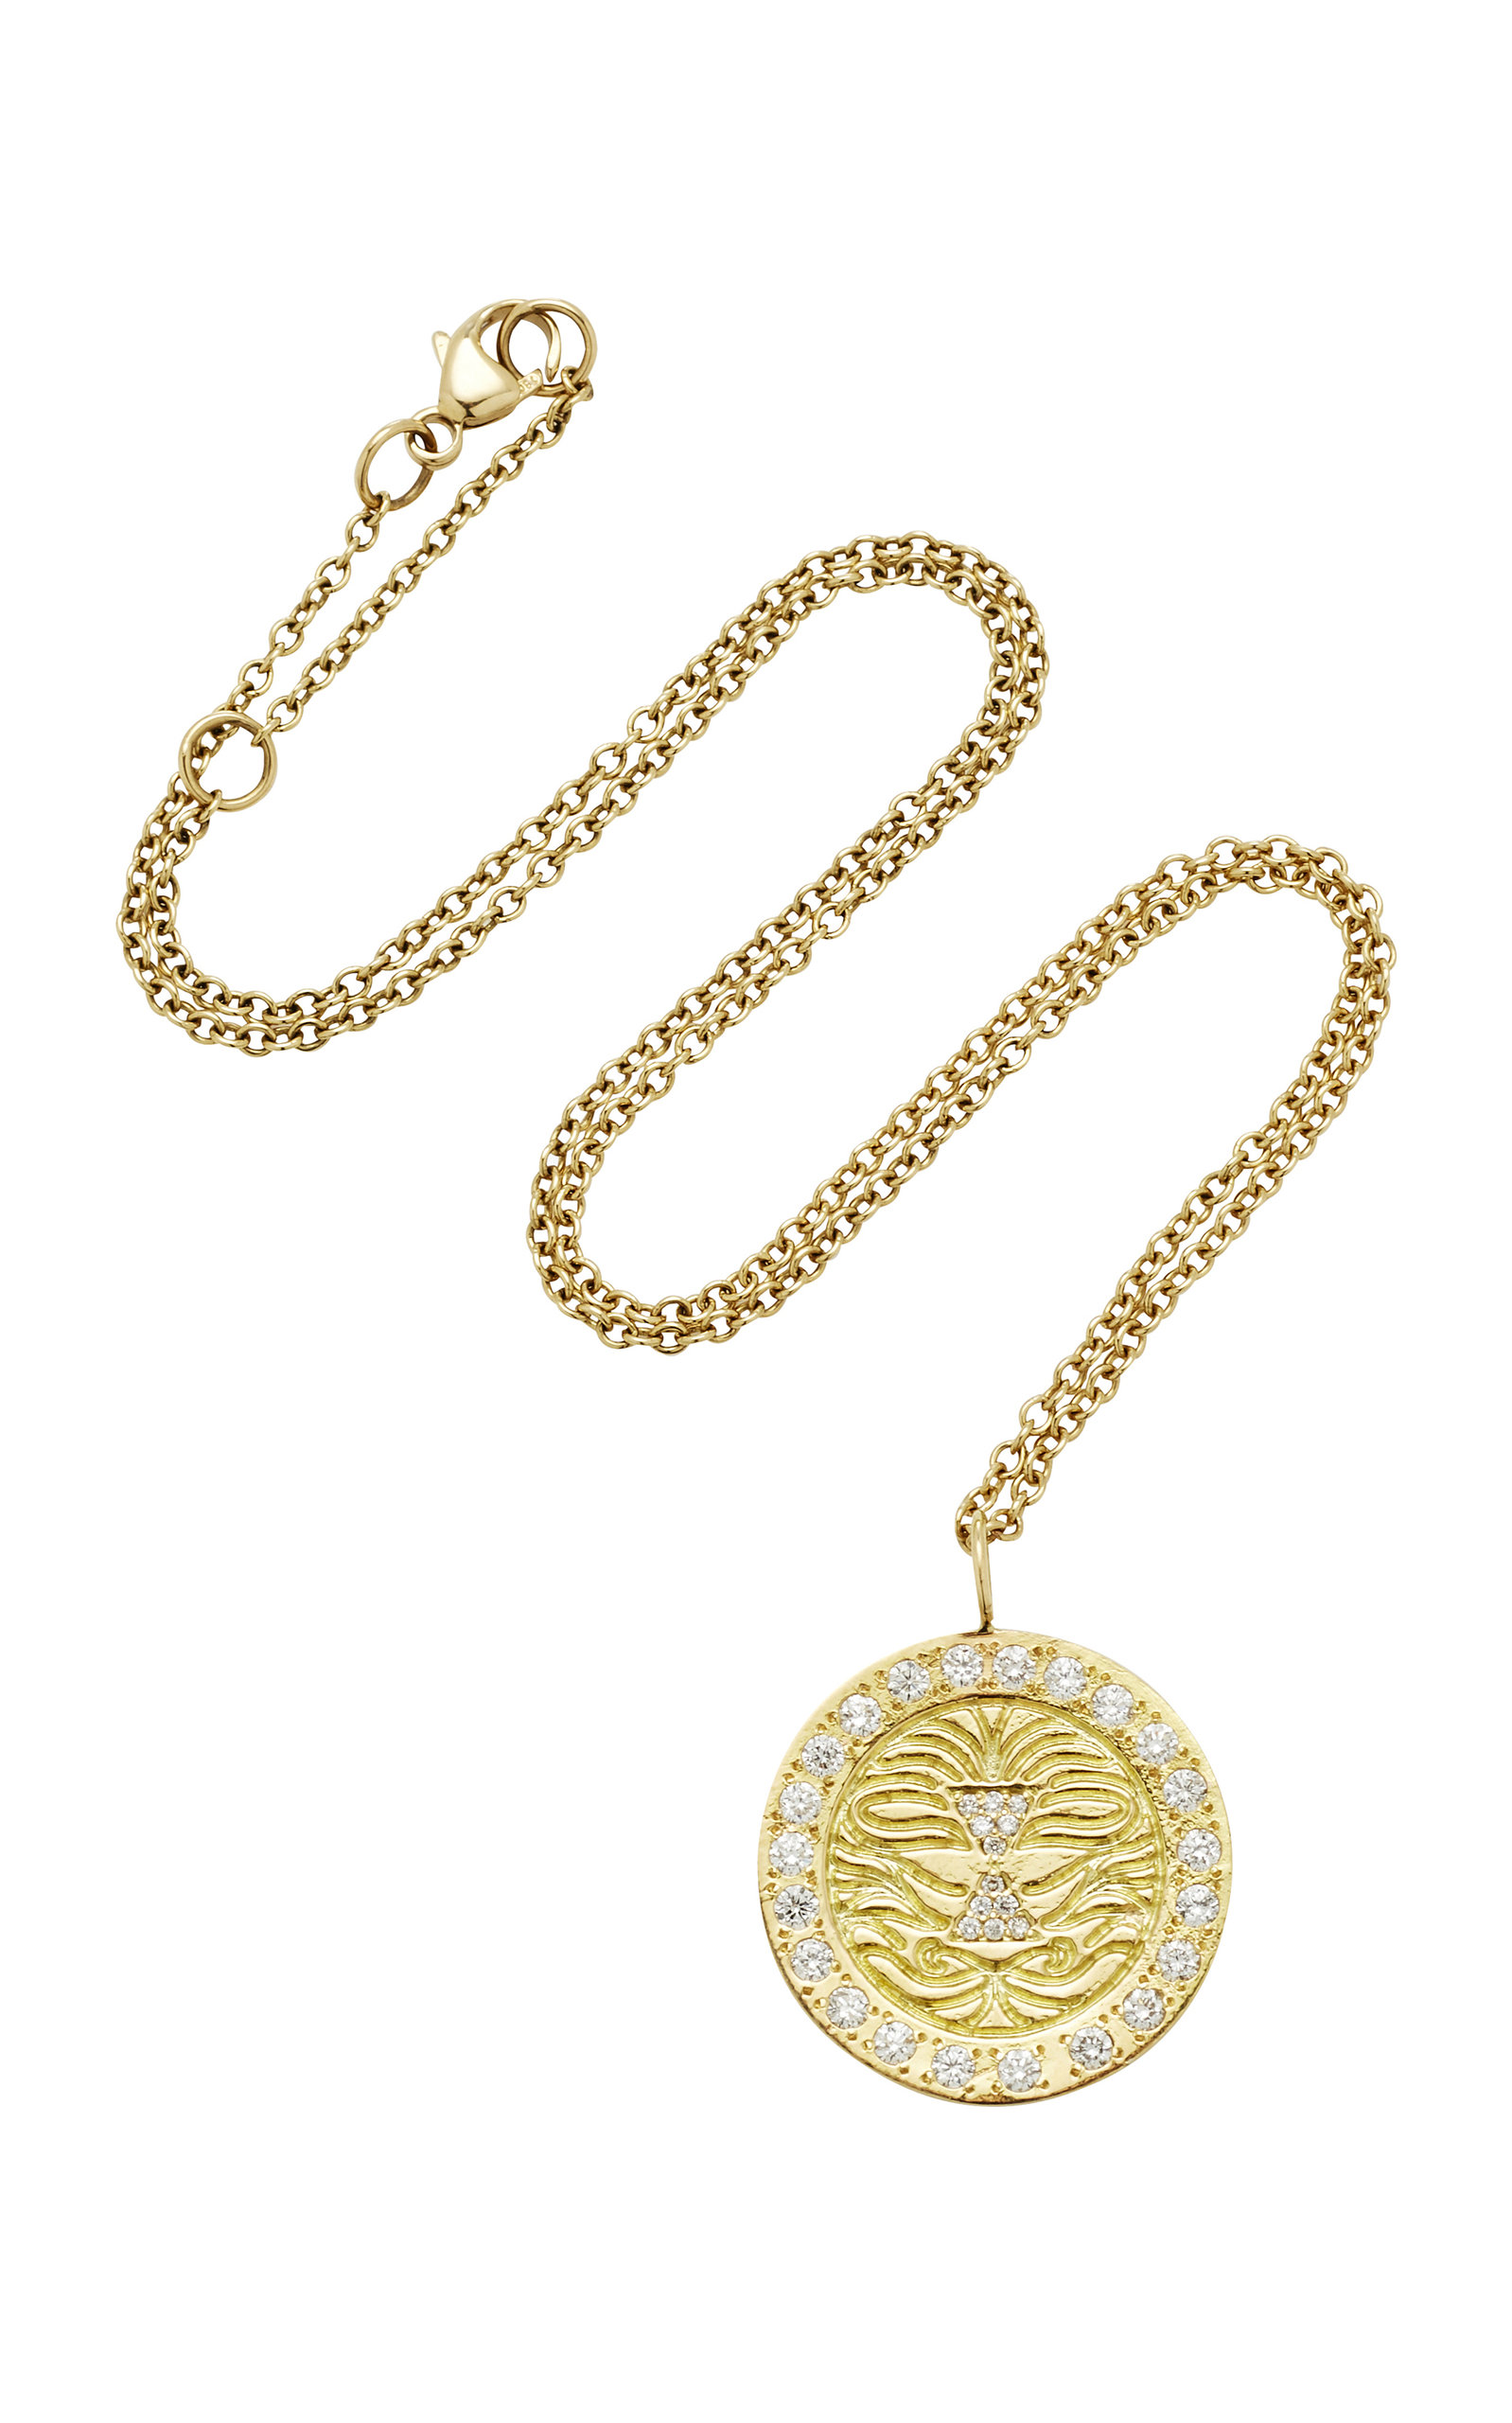 MISAHARA LION CHARM 18K GOLD DIAMOND NECKLACE